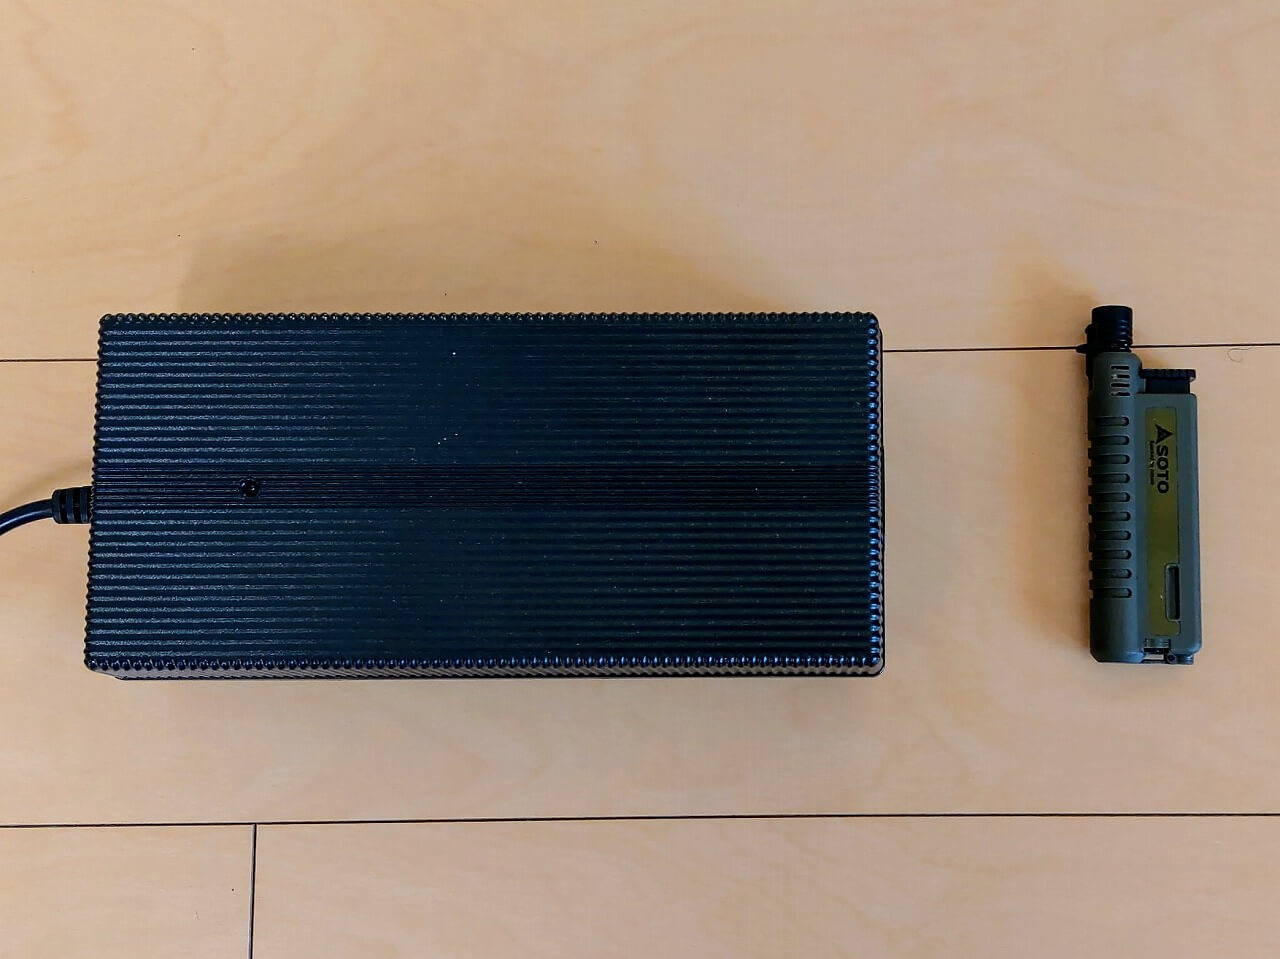 BLUETTI ポータブル電源 AC200PのACアダプターをスライドガストーチ